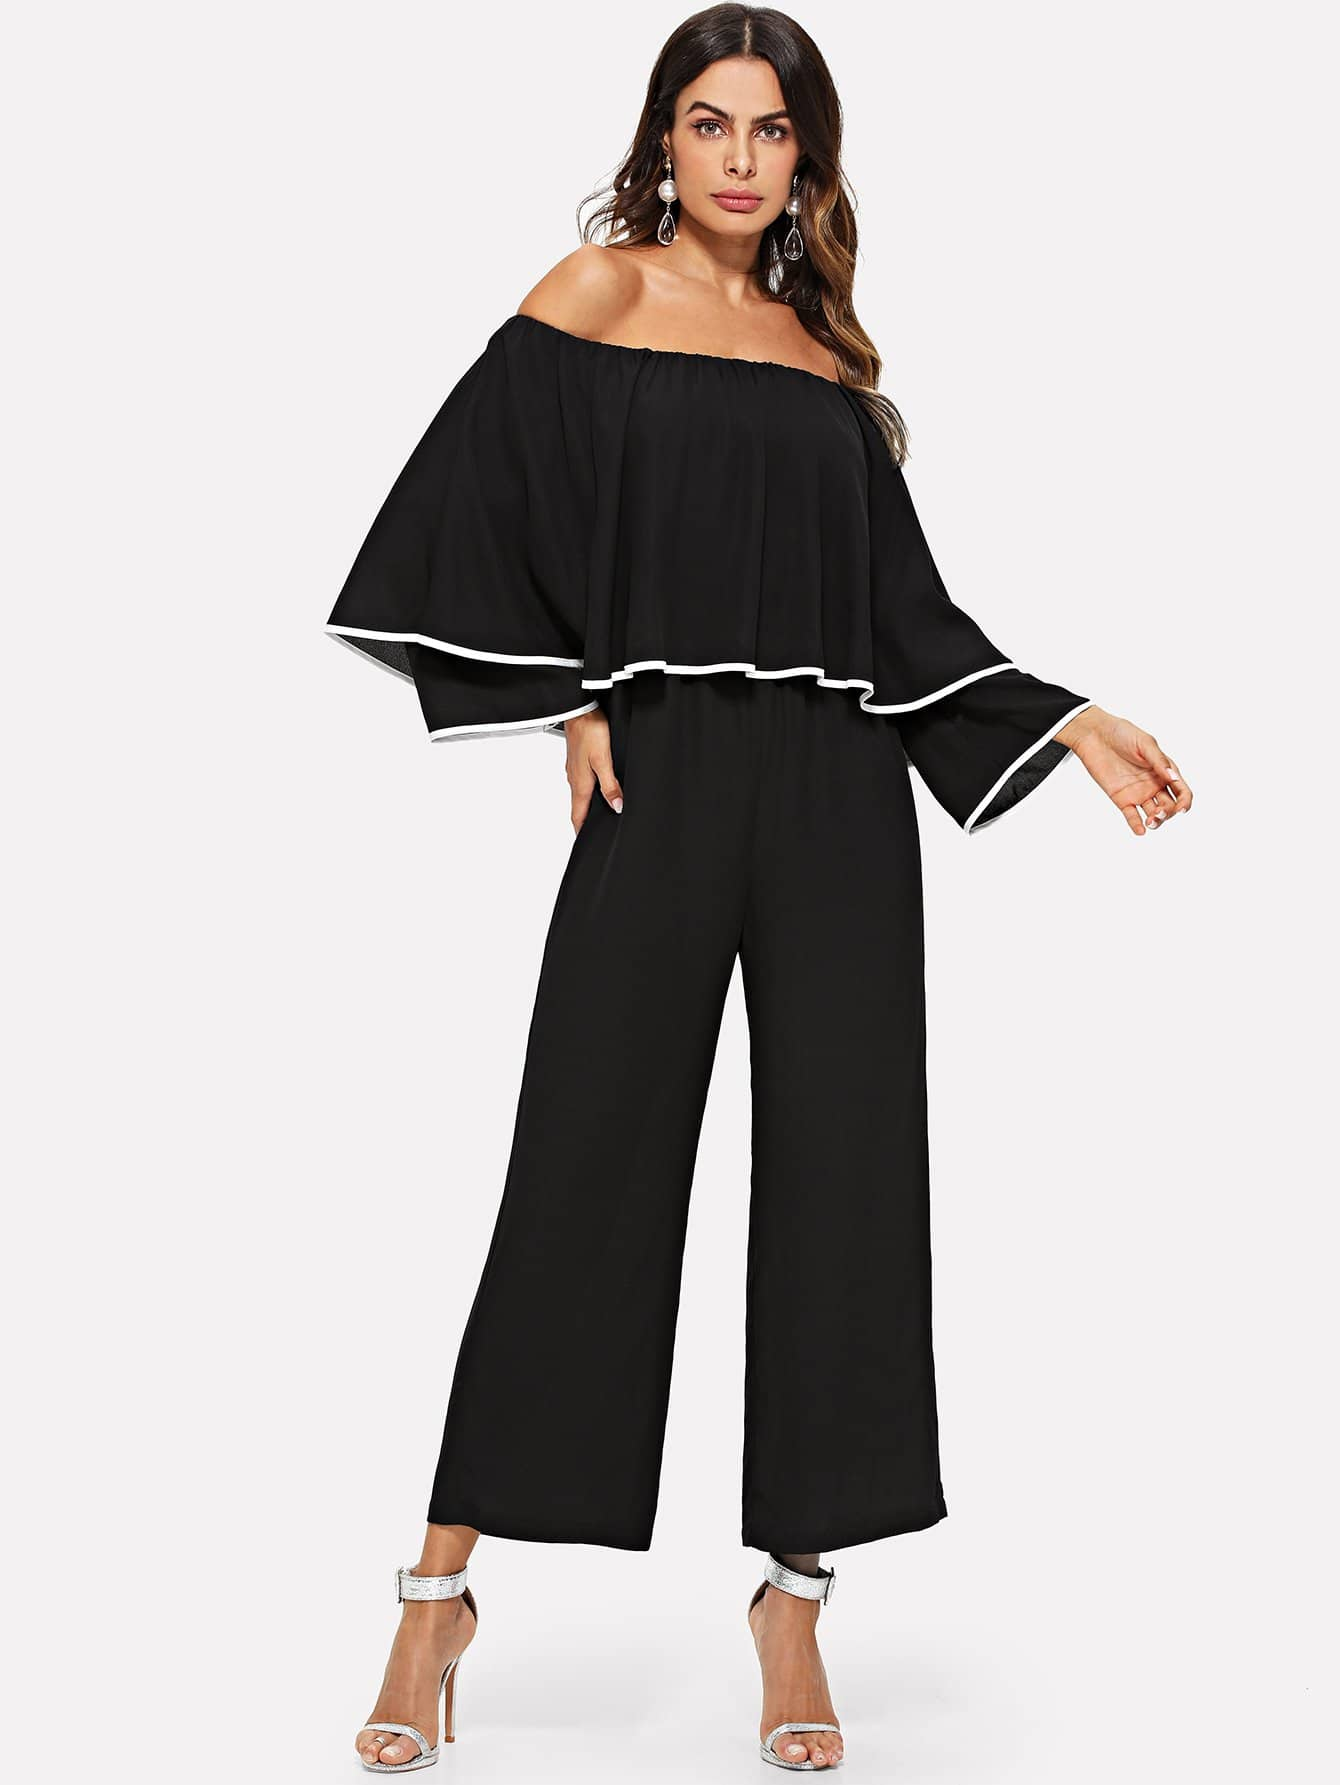 Contrast Binding Layered Wide Leg Jumpsuit contrast halter and binding layered ruffle bodice jumpsuit